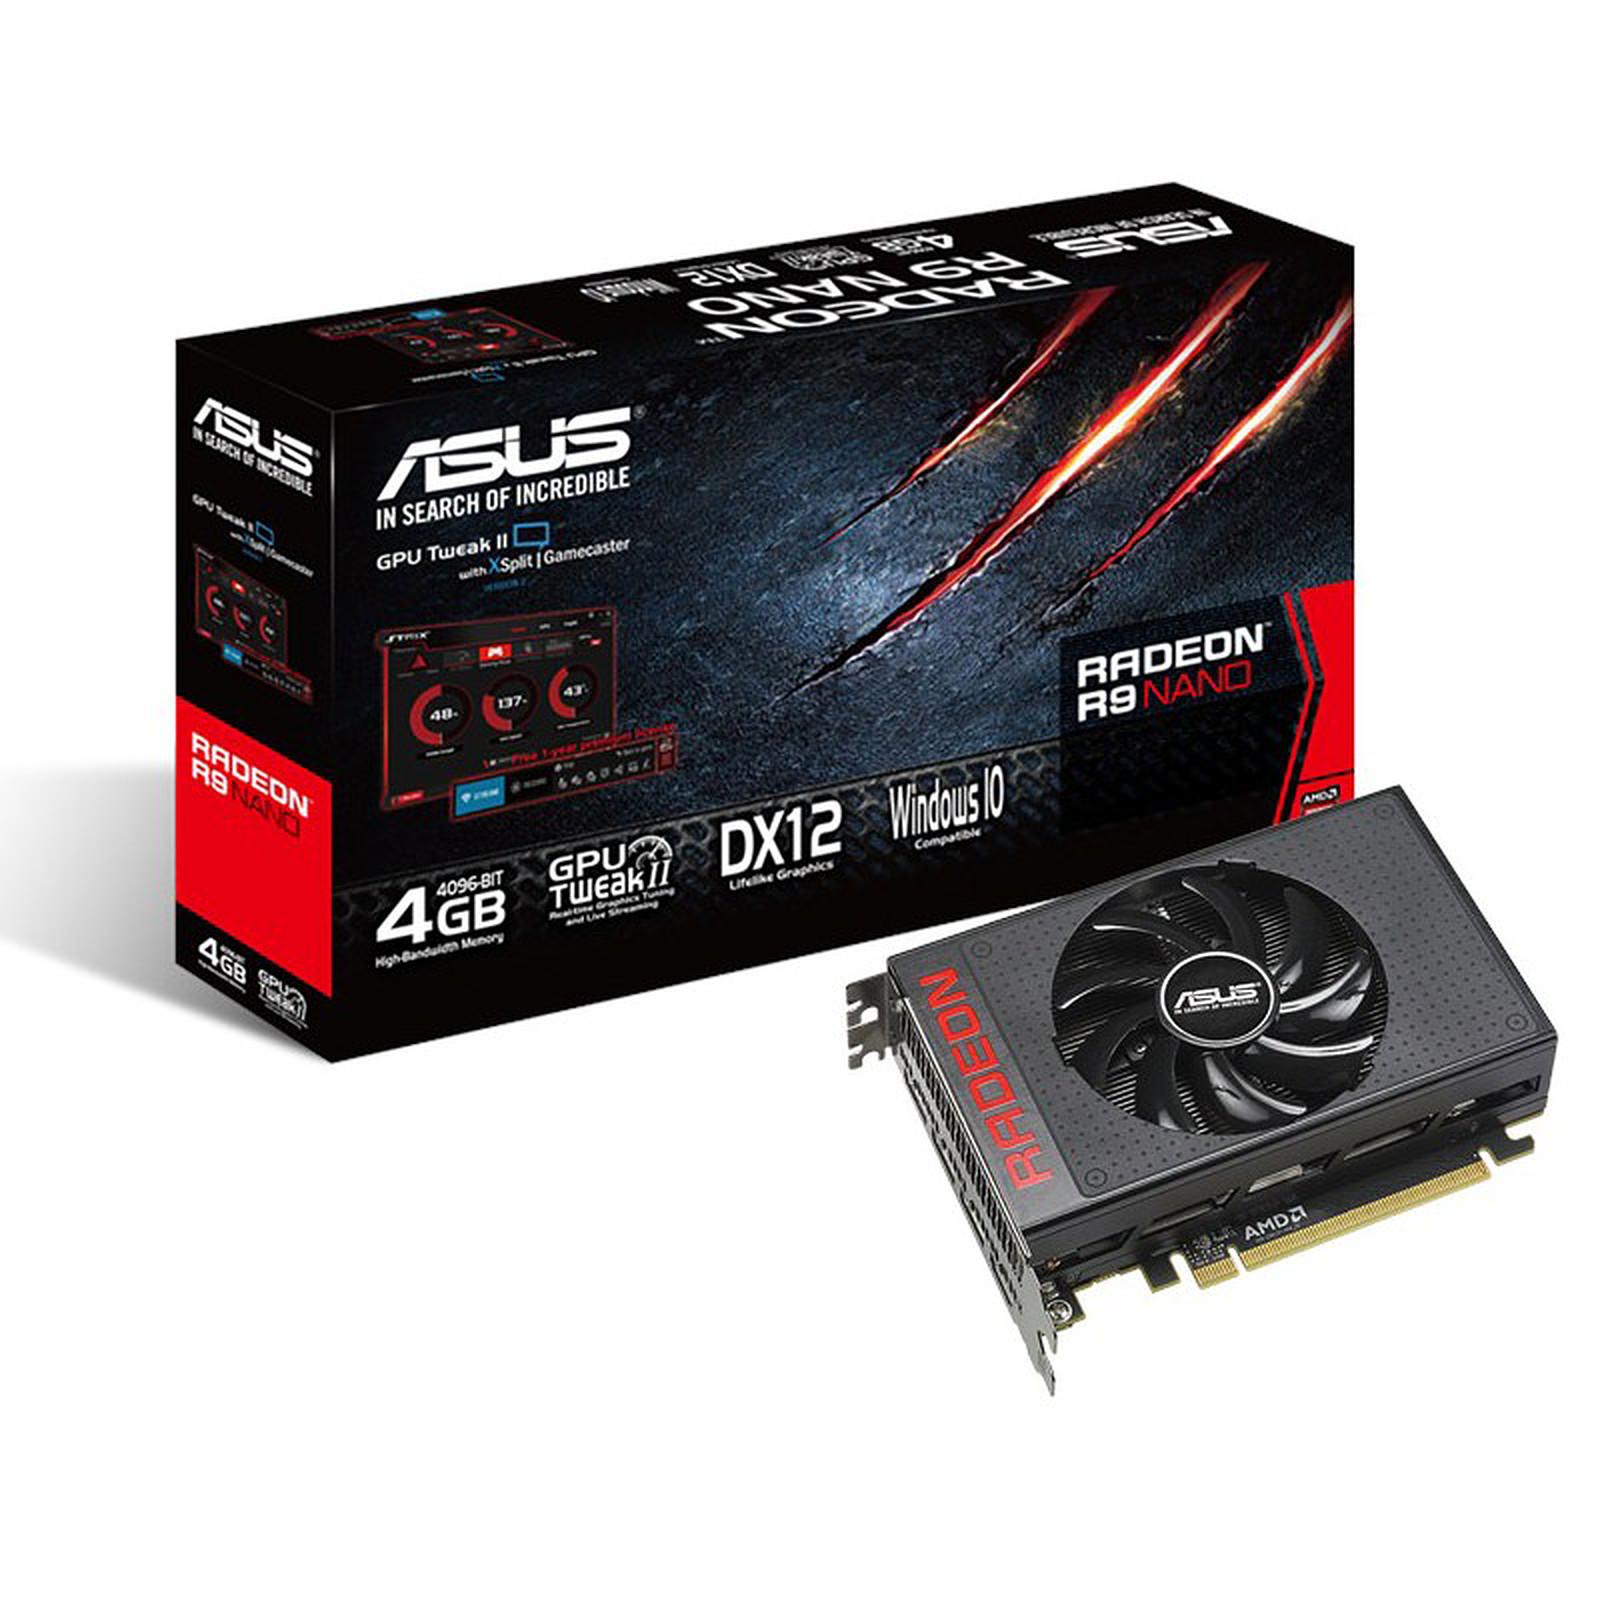 ASUS Radeon R9 Nano R9NANO-4G